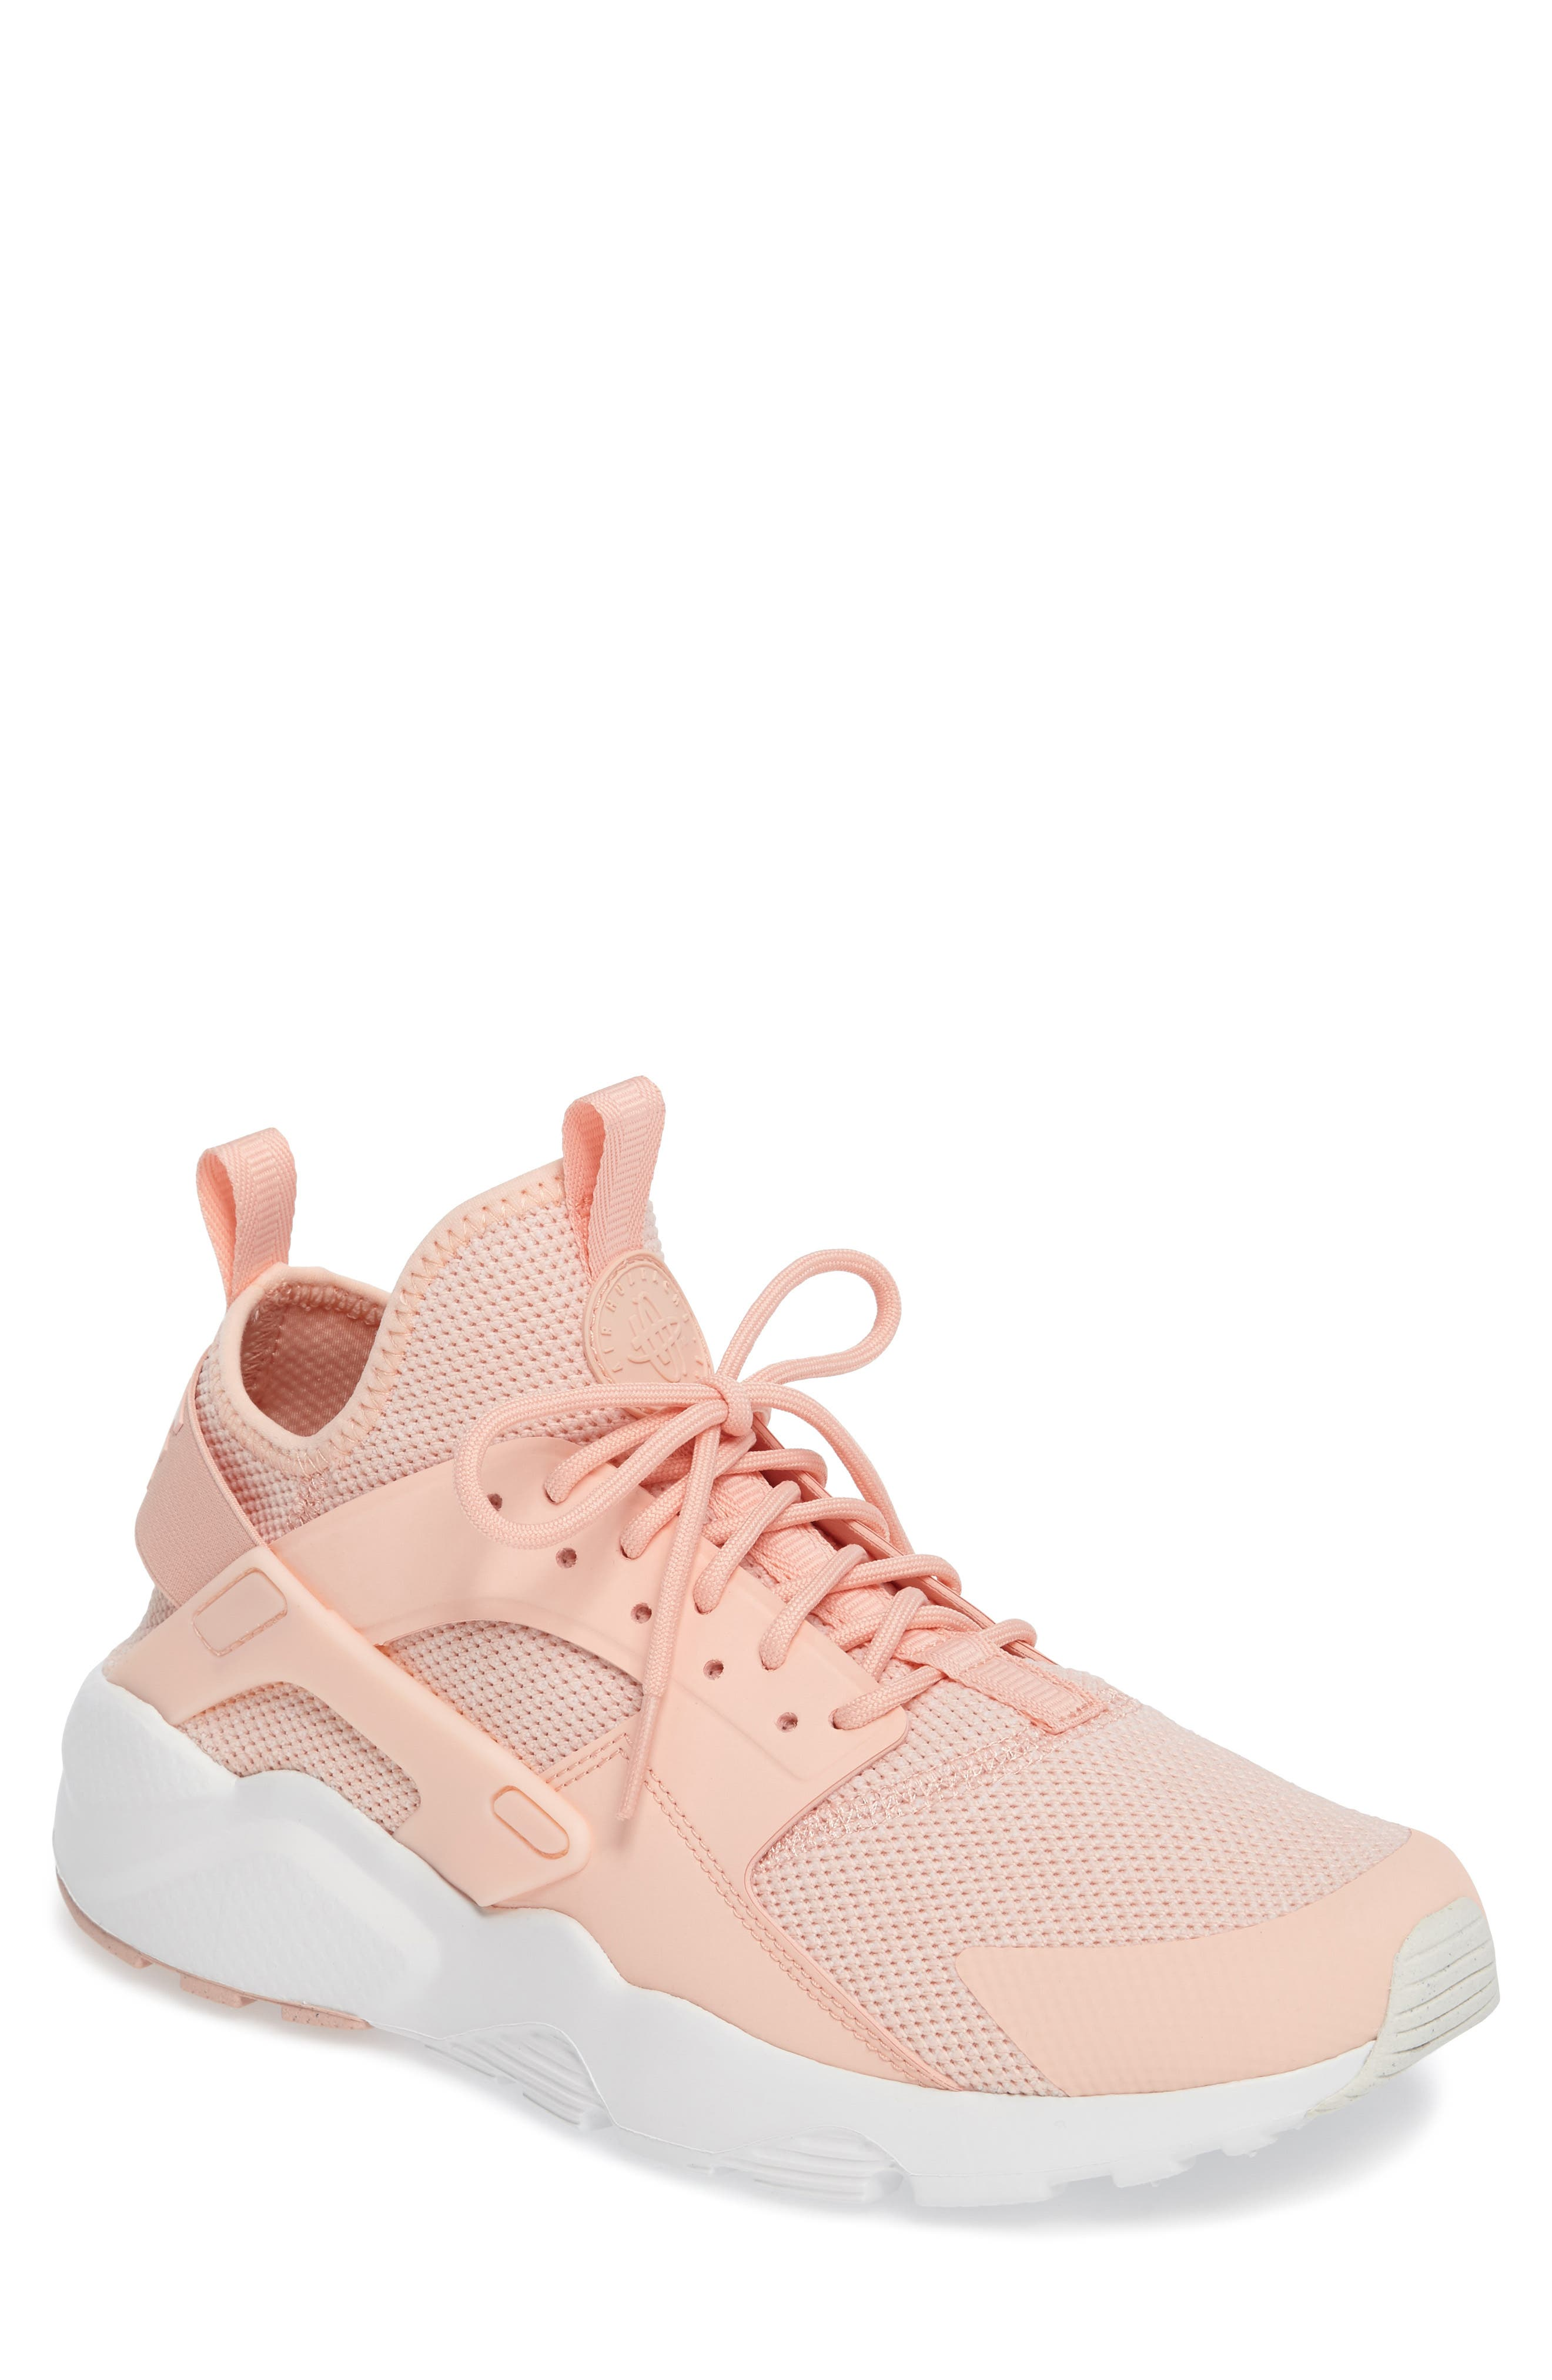 Main Image - Nike Air Huarache Ultra Breathe Sneaker (Men)